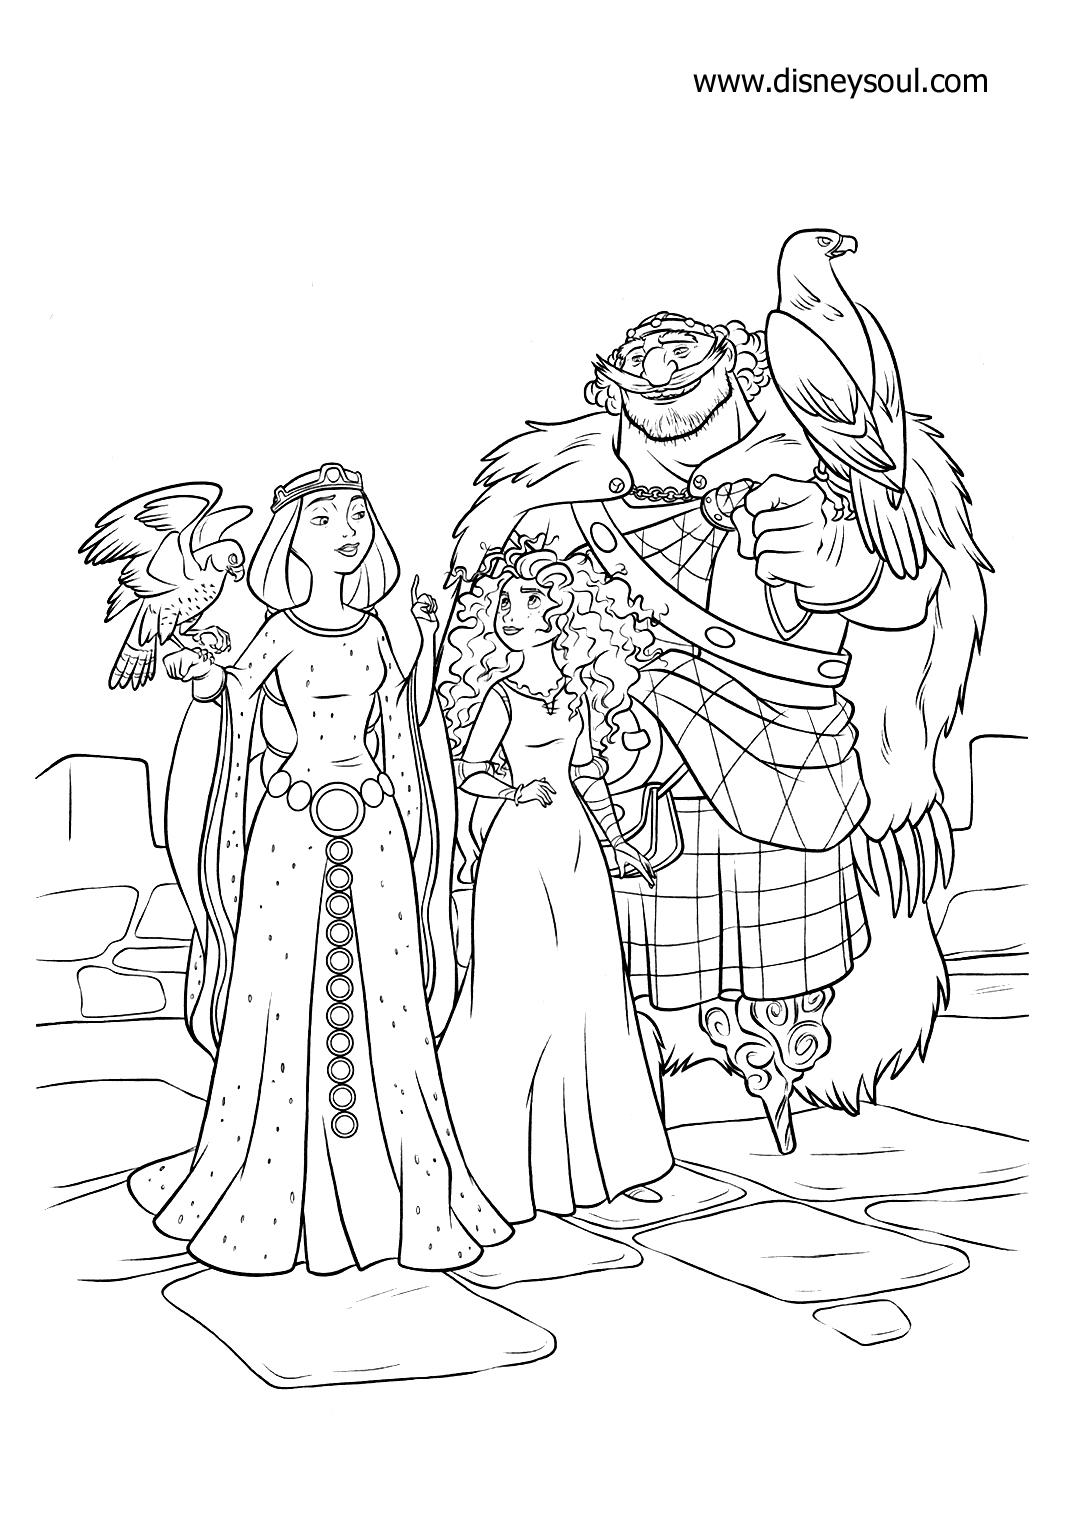 Disney Soul Dibujos para colorear de Brave Indomable  Valiente